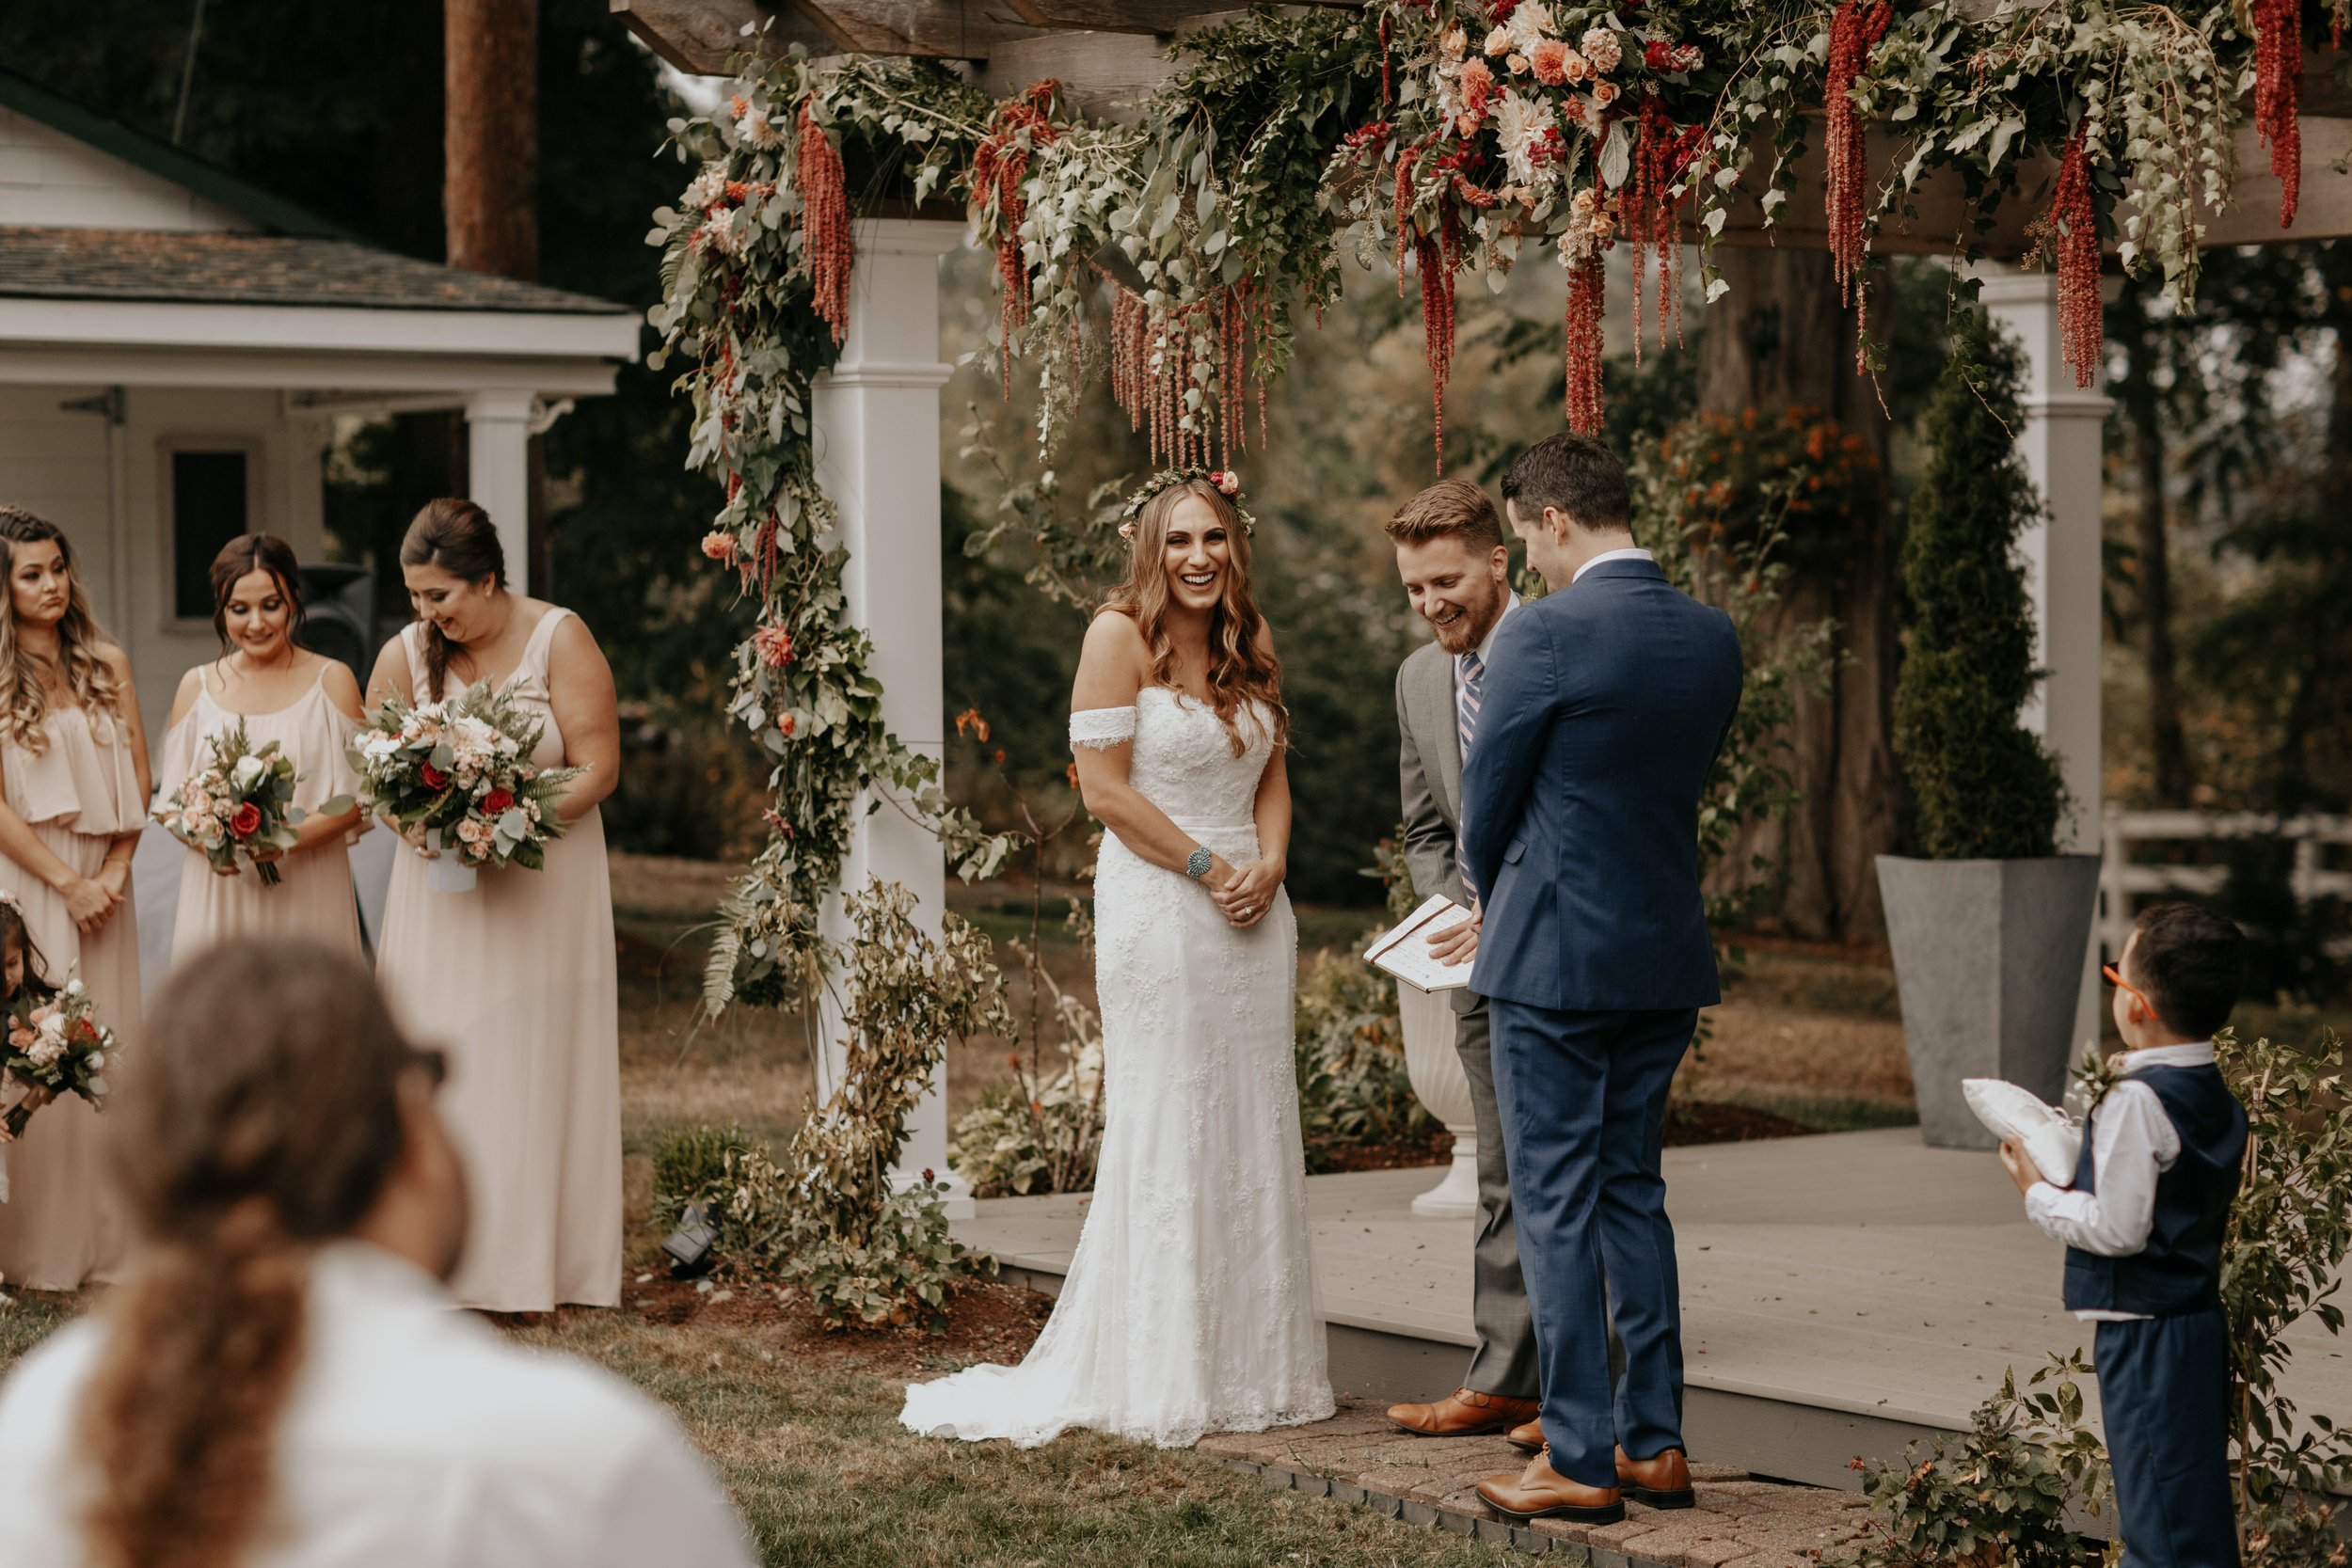 ginapaulson_jakitrevor_wedding-619.jpg